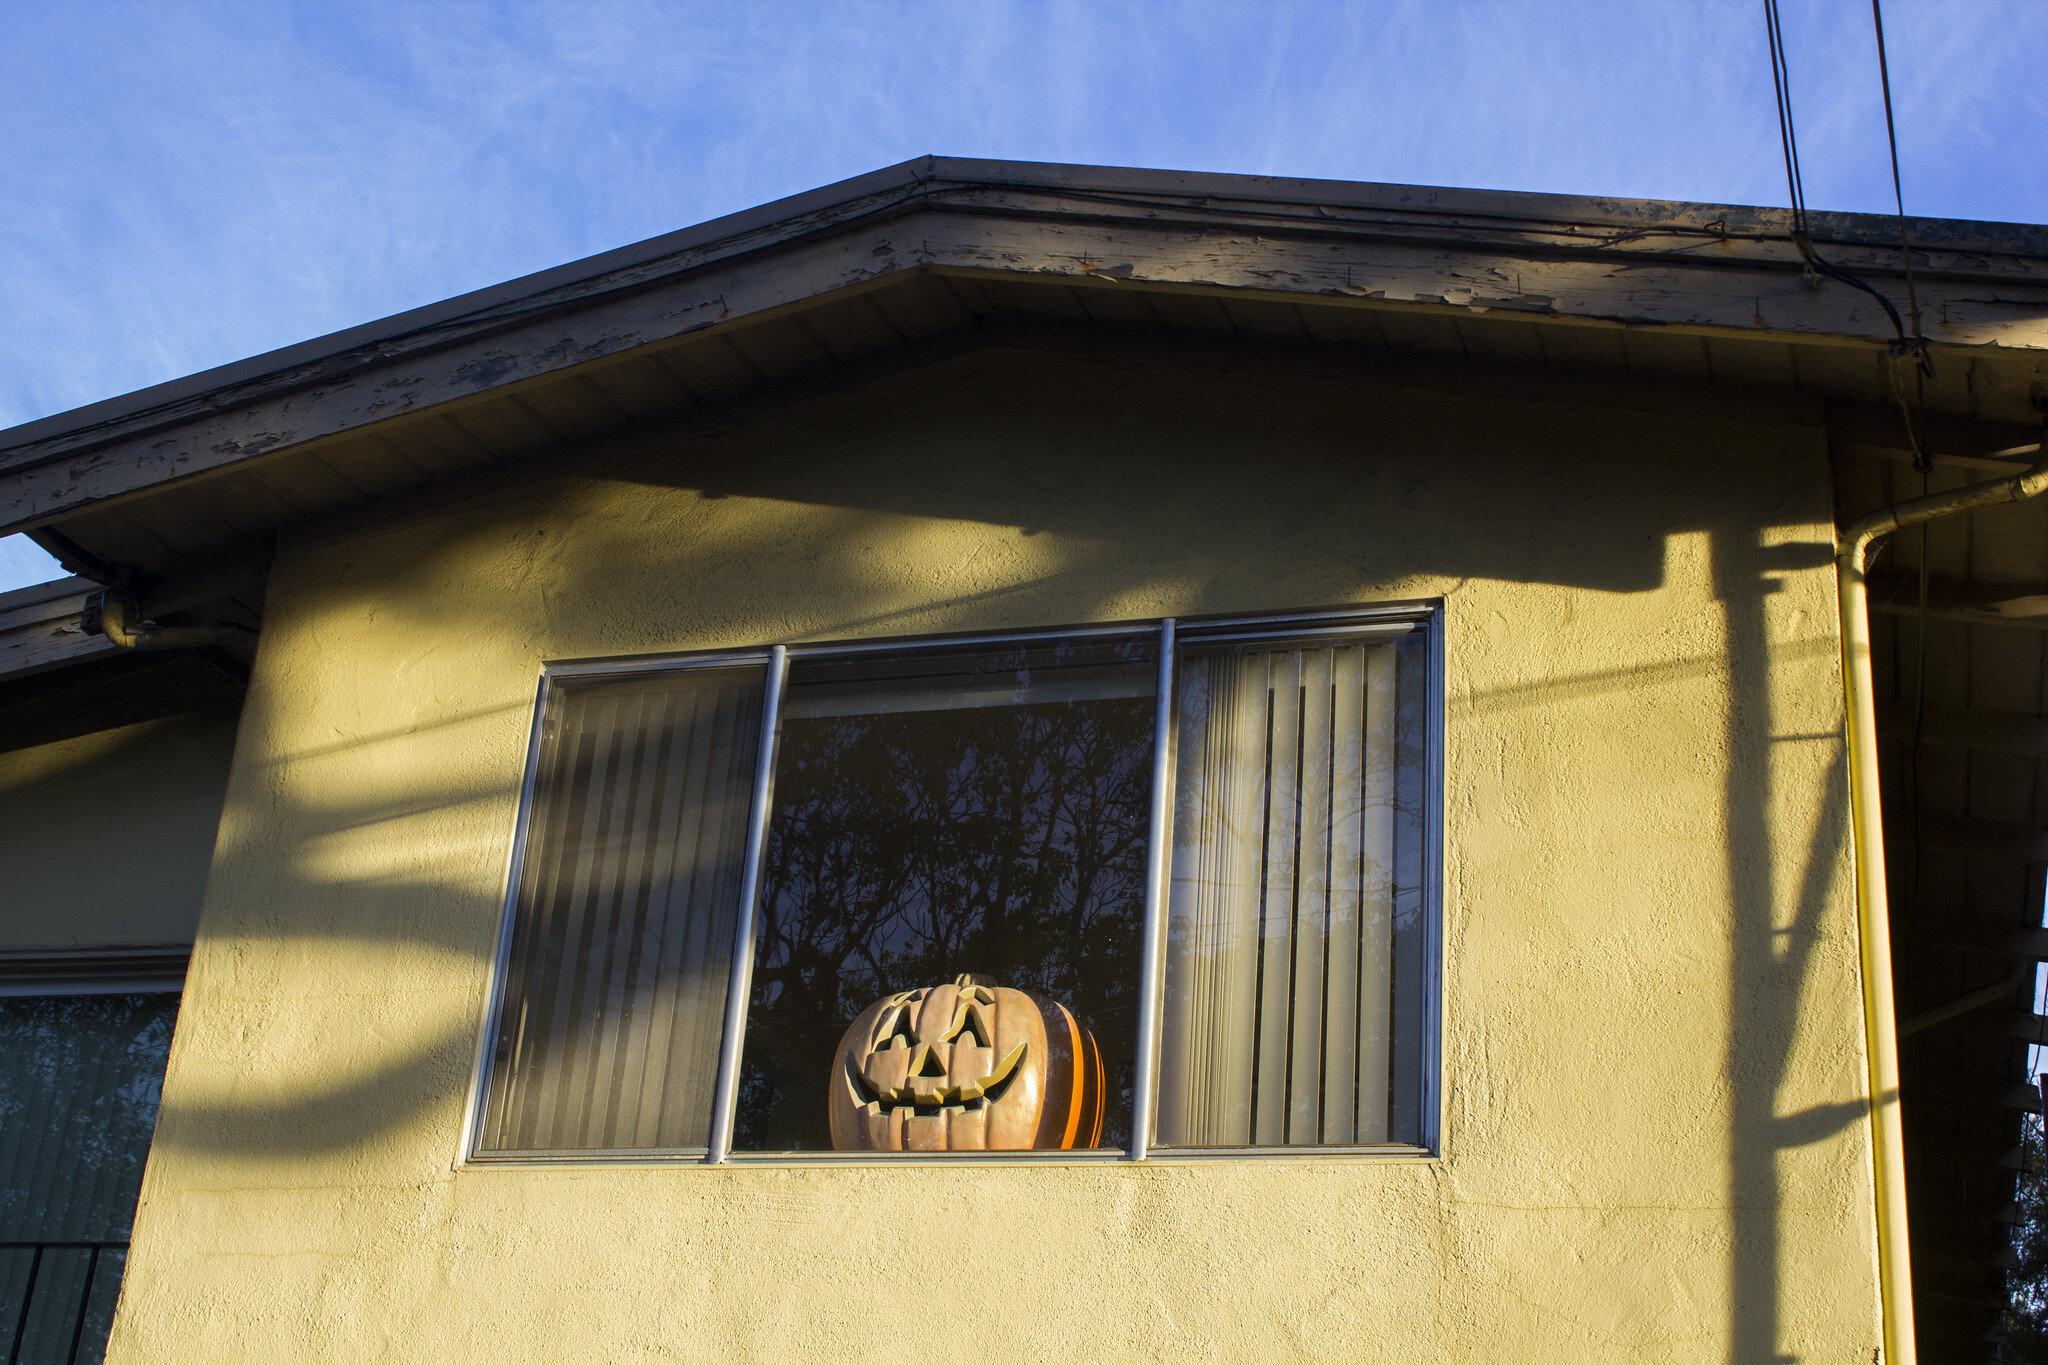 Keep your doorstep bear free by placing pumpkins inside windows